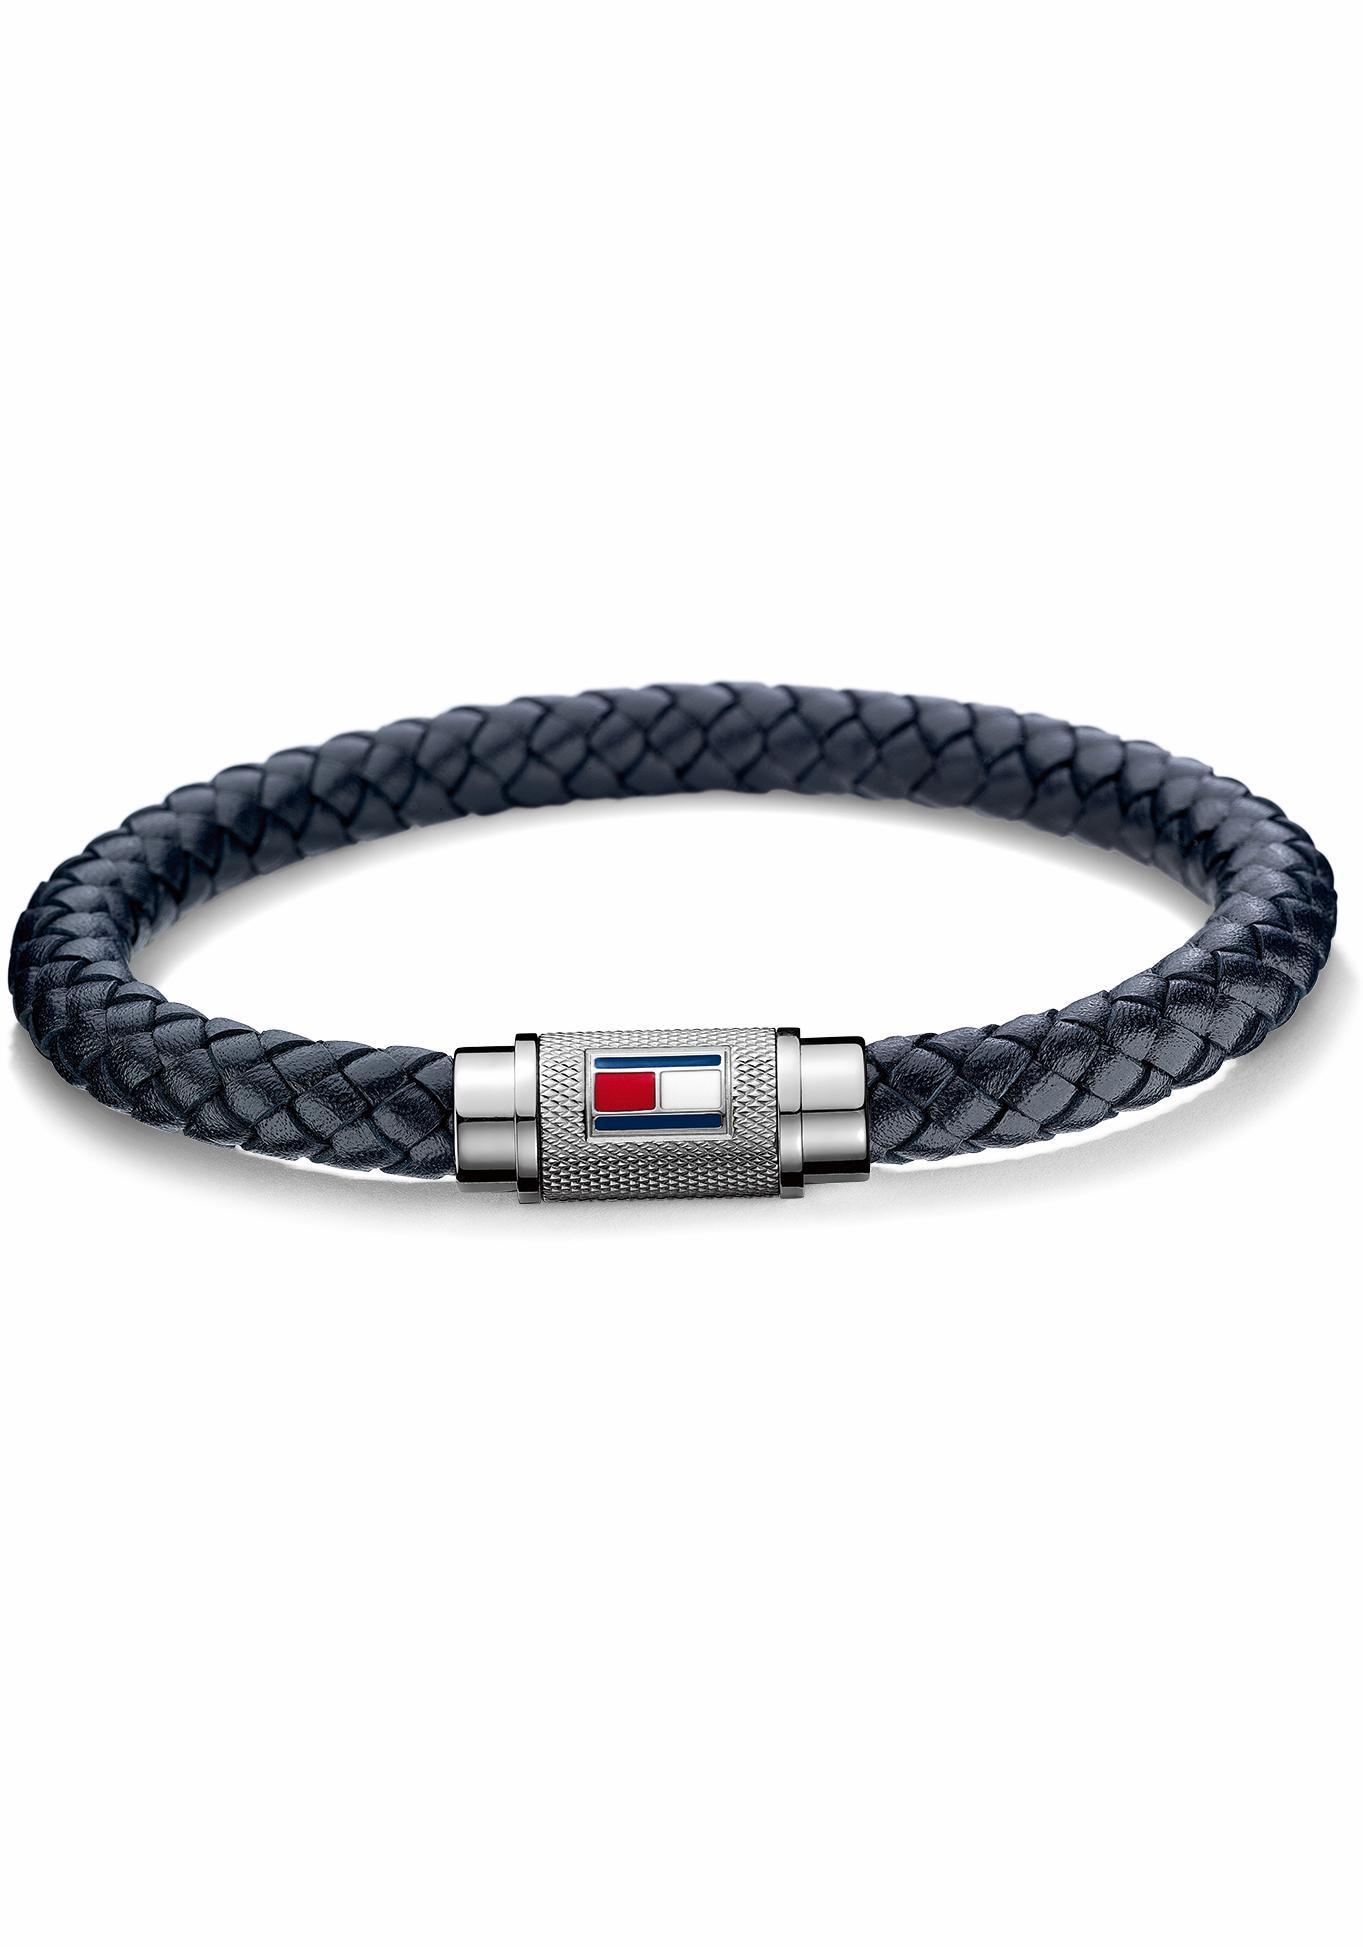 TOMMY HILFIGER Armband Casual Core 2701000   Schmuck > Armbänder   Blau   Tommy Hilfiger